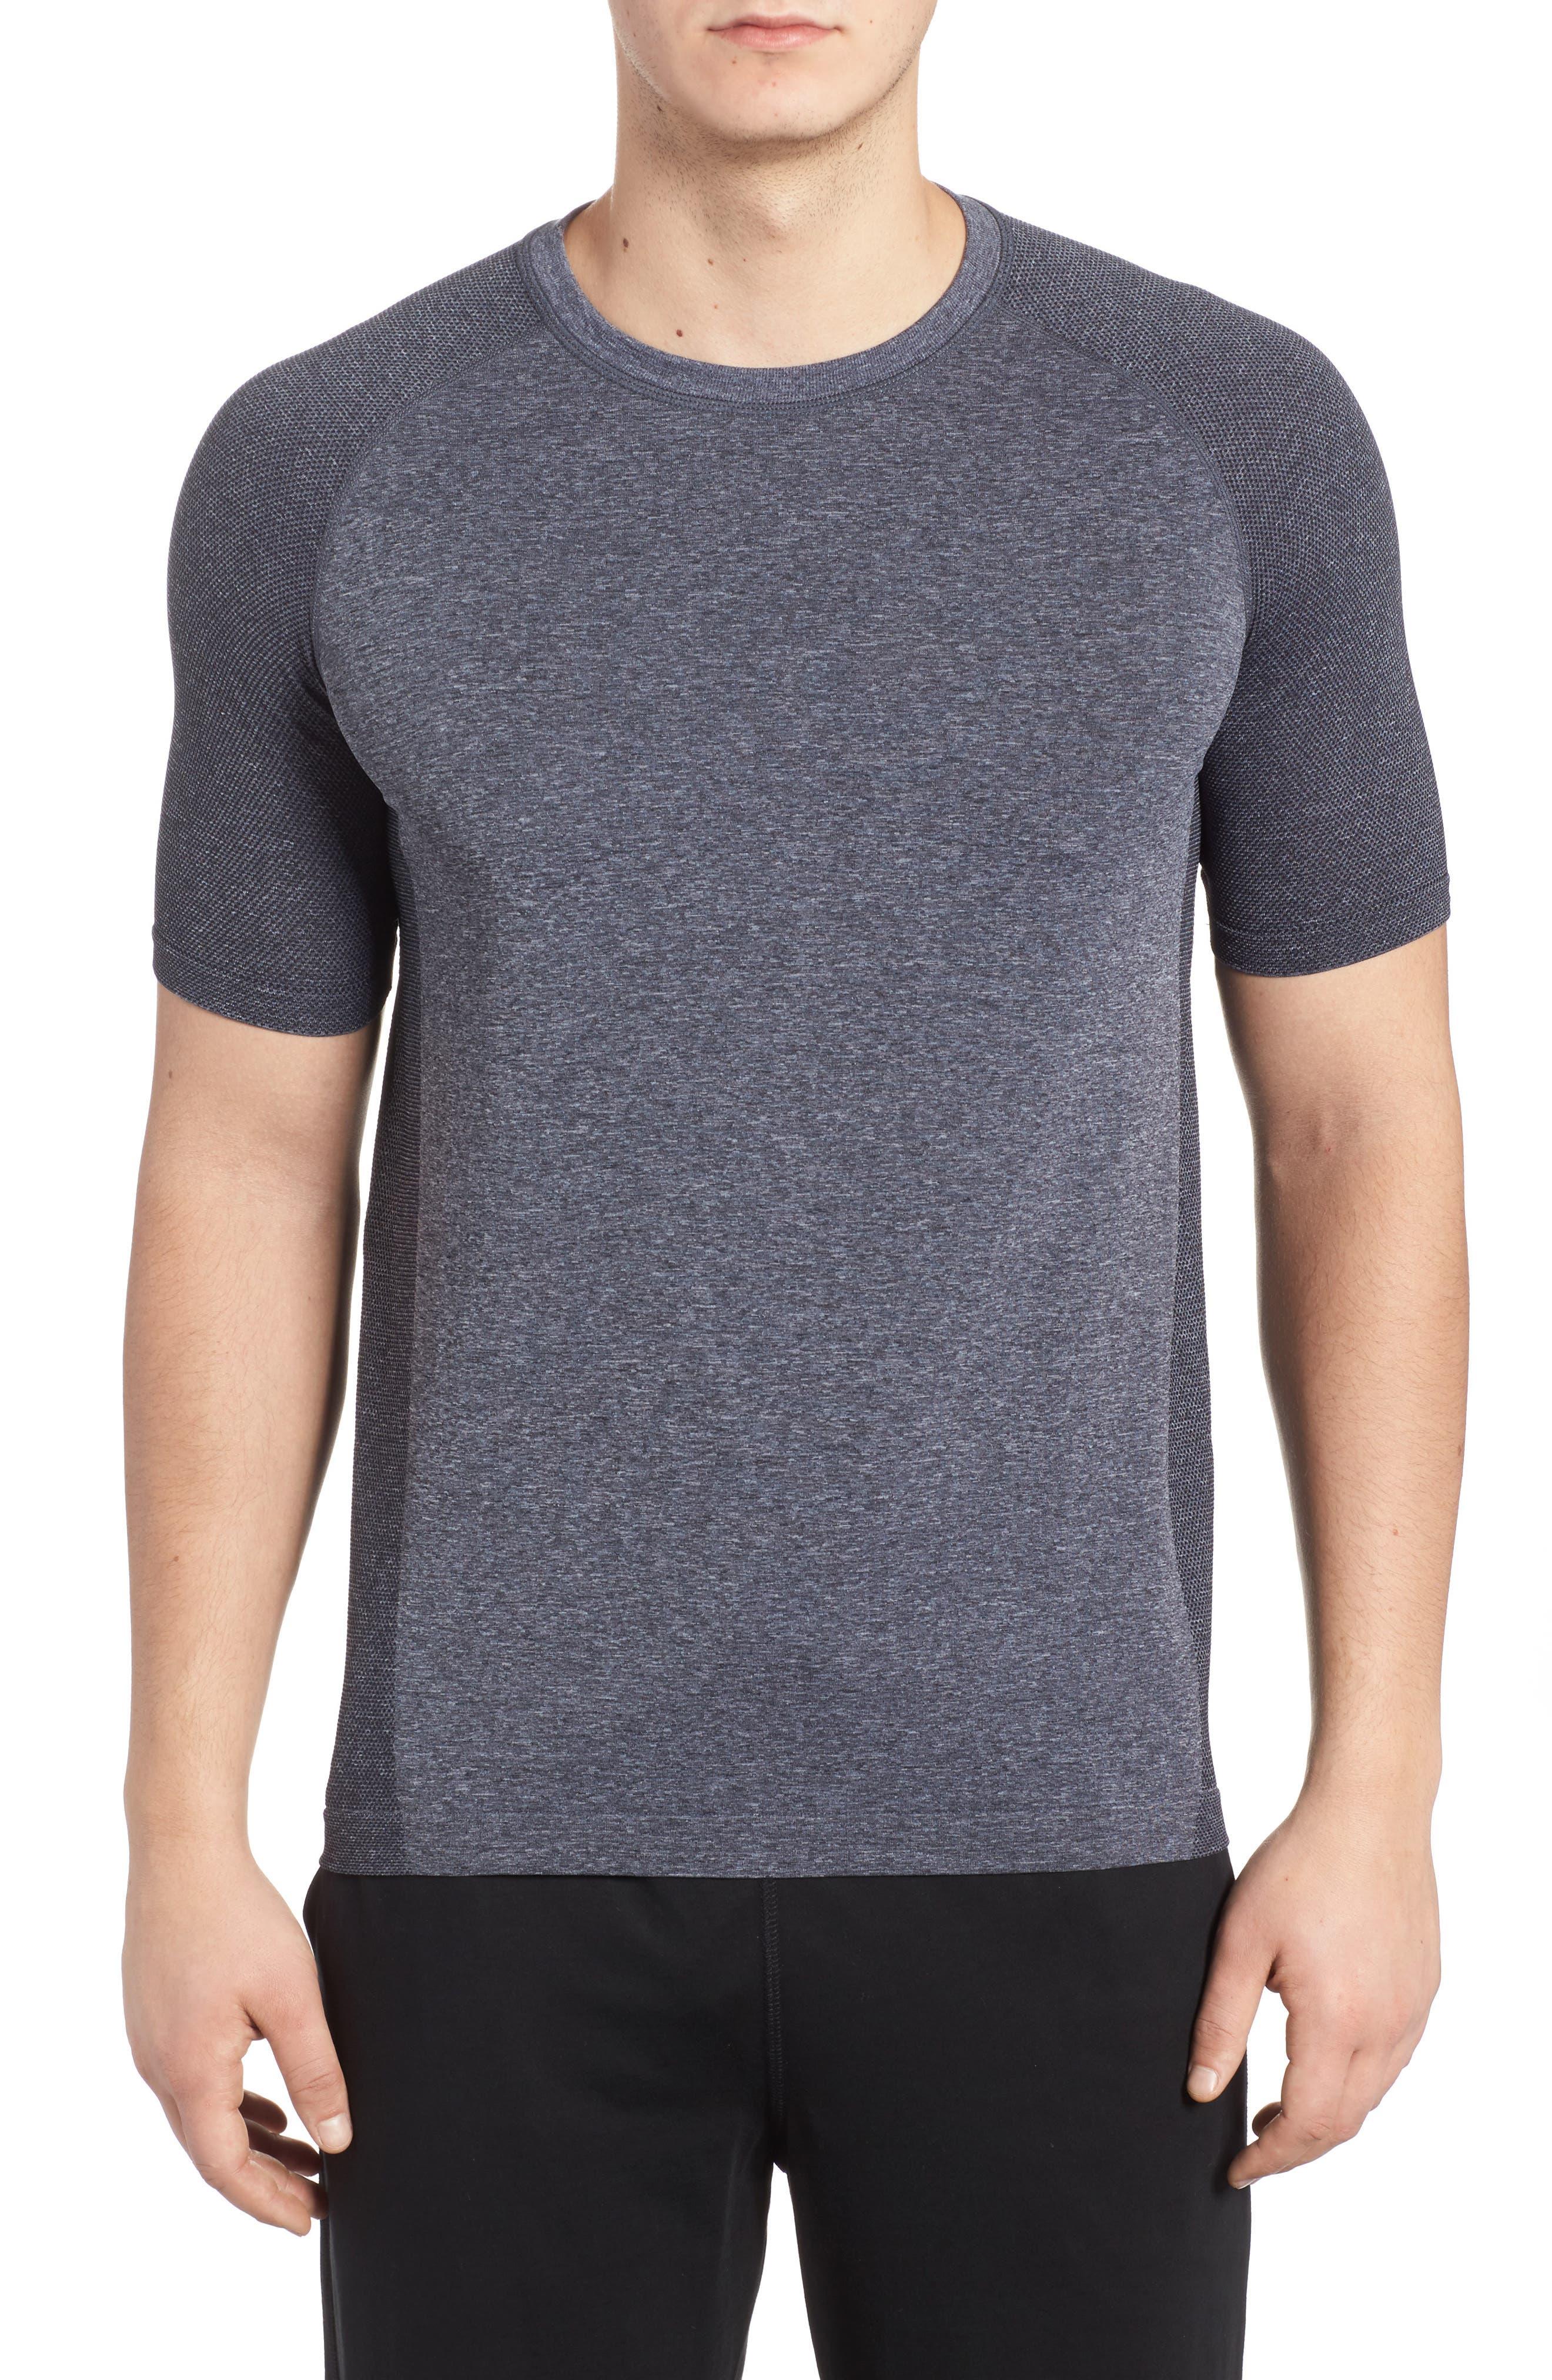 Vapor Performance T-Shirt,                             Main thumbnail 1, color,                             ASPHALT